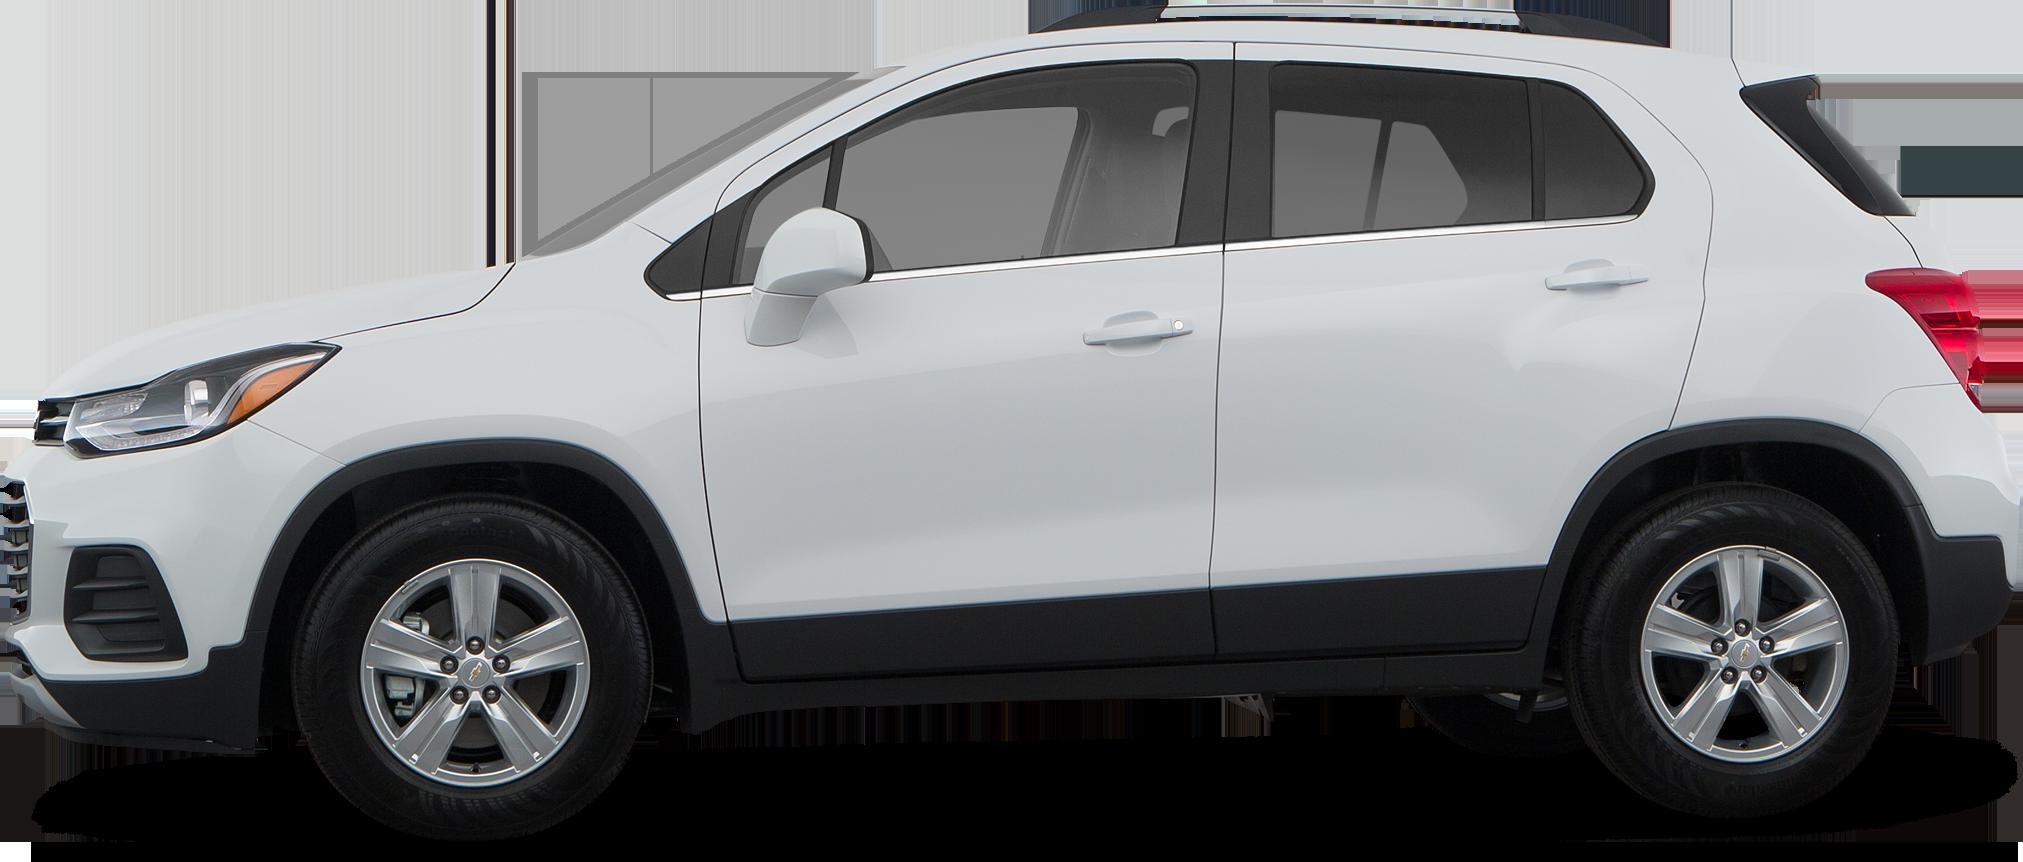 2019 Chevrolet Trax SUV LT